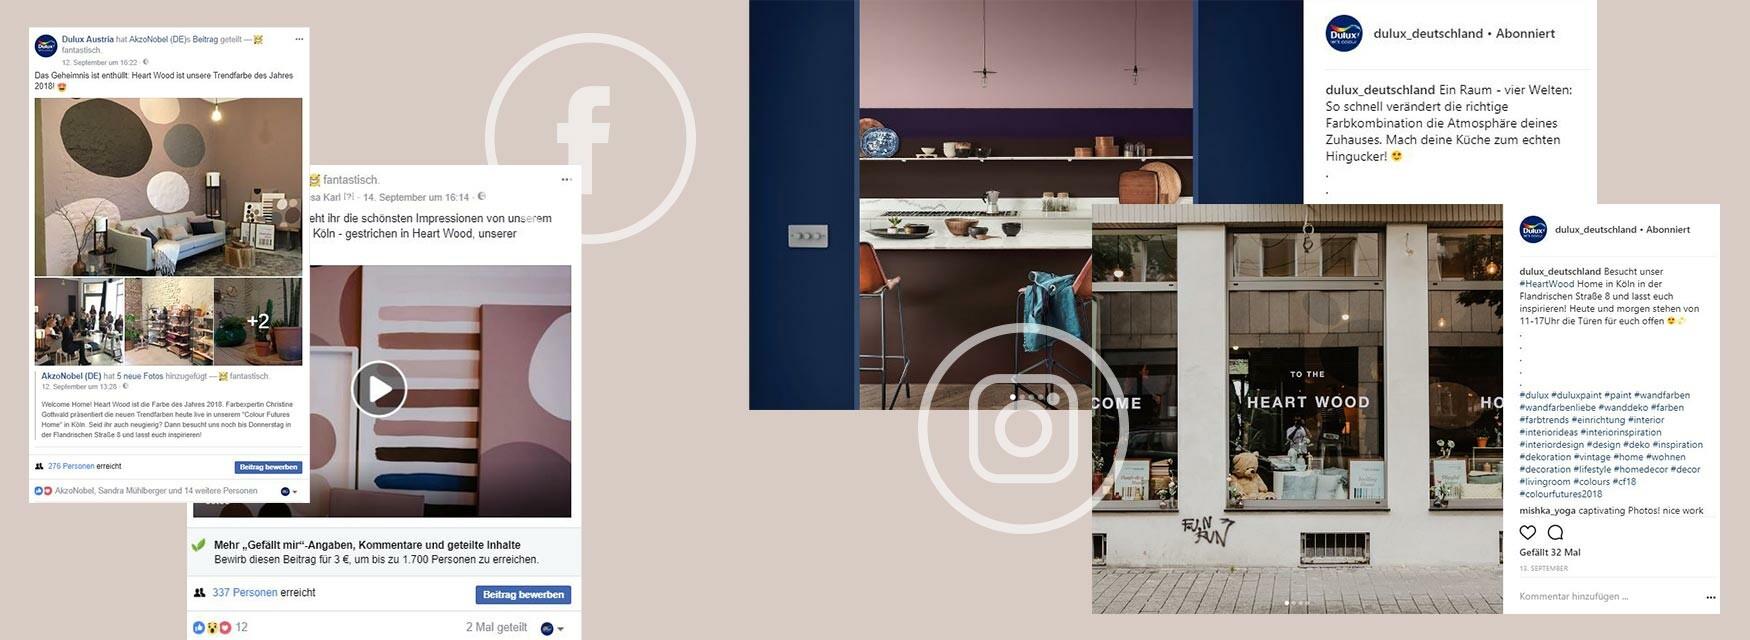 Screenshot Trendfarbe AkzoNobel Content Relations Social Media